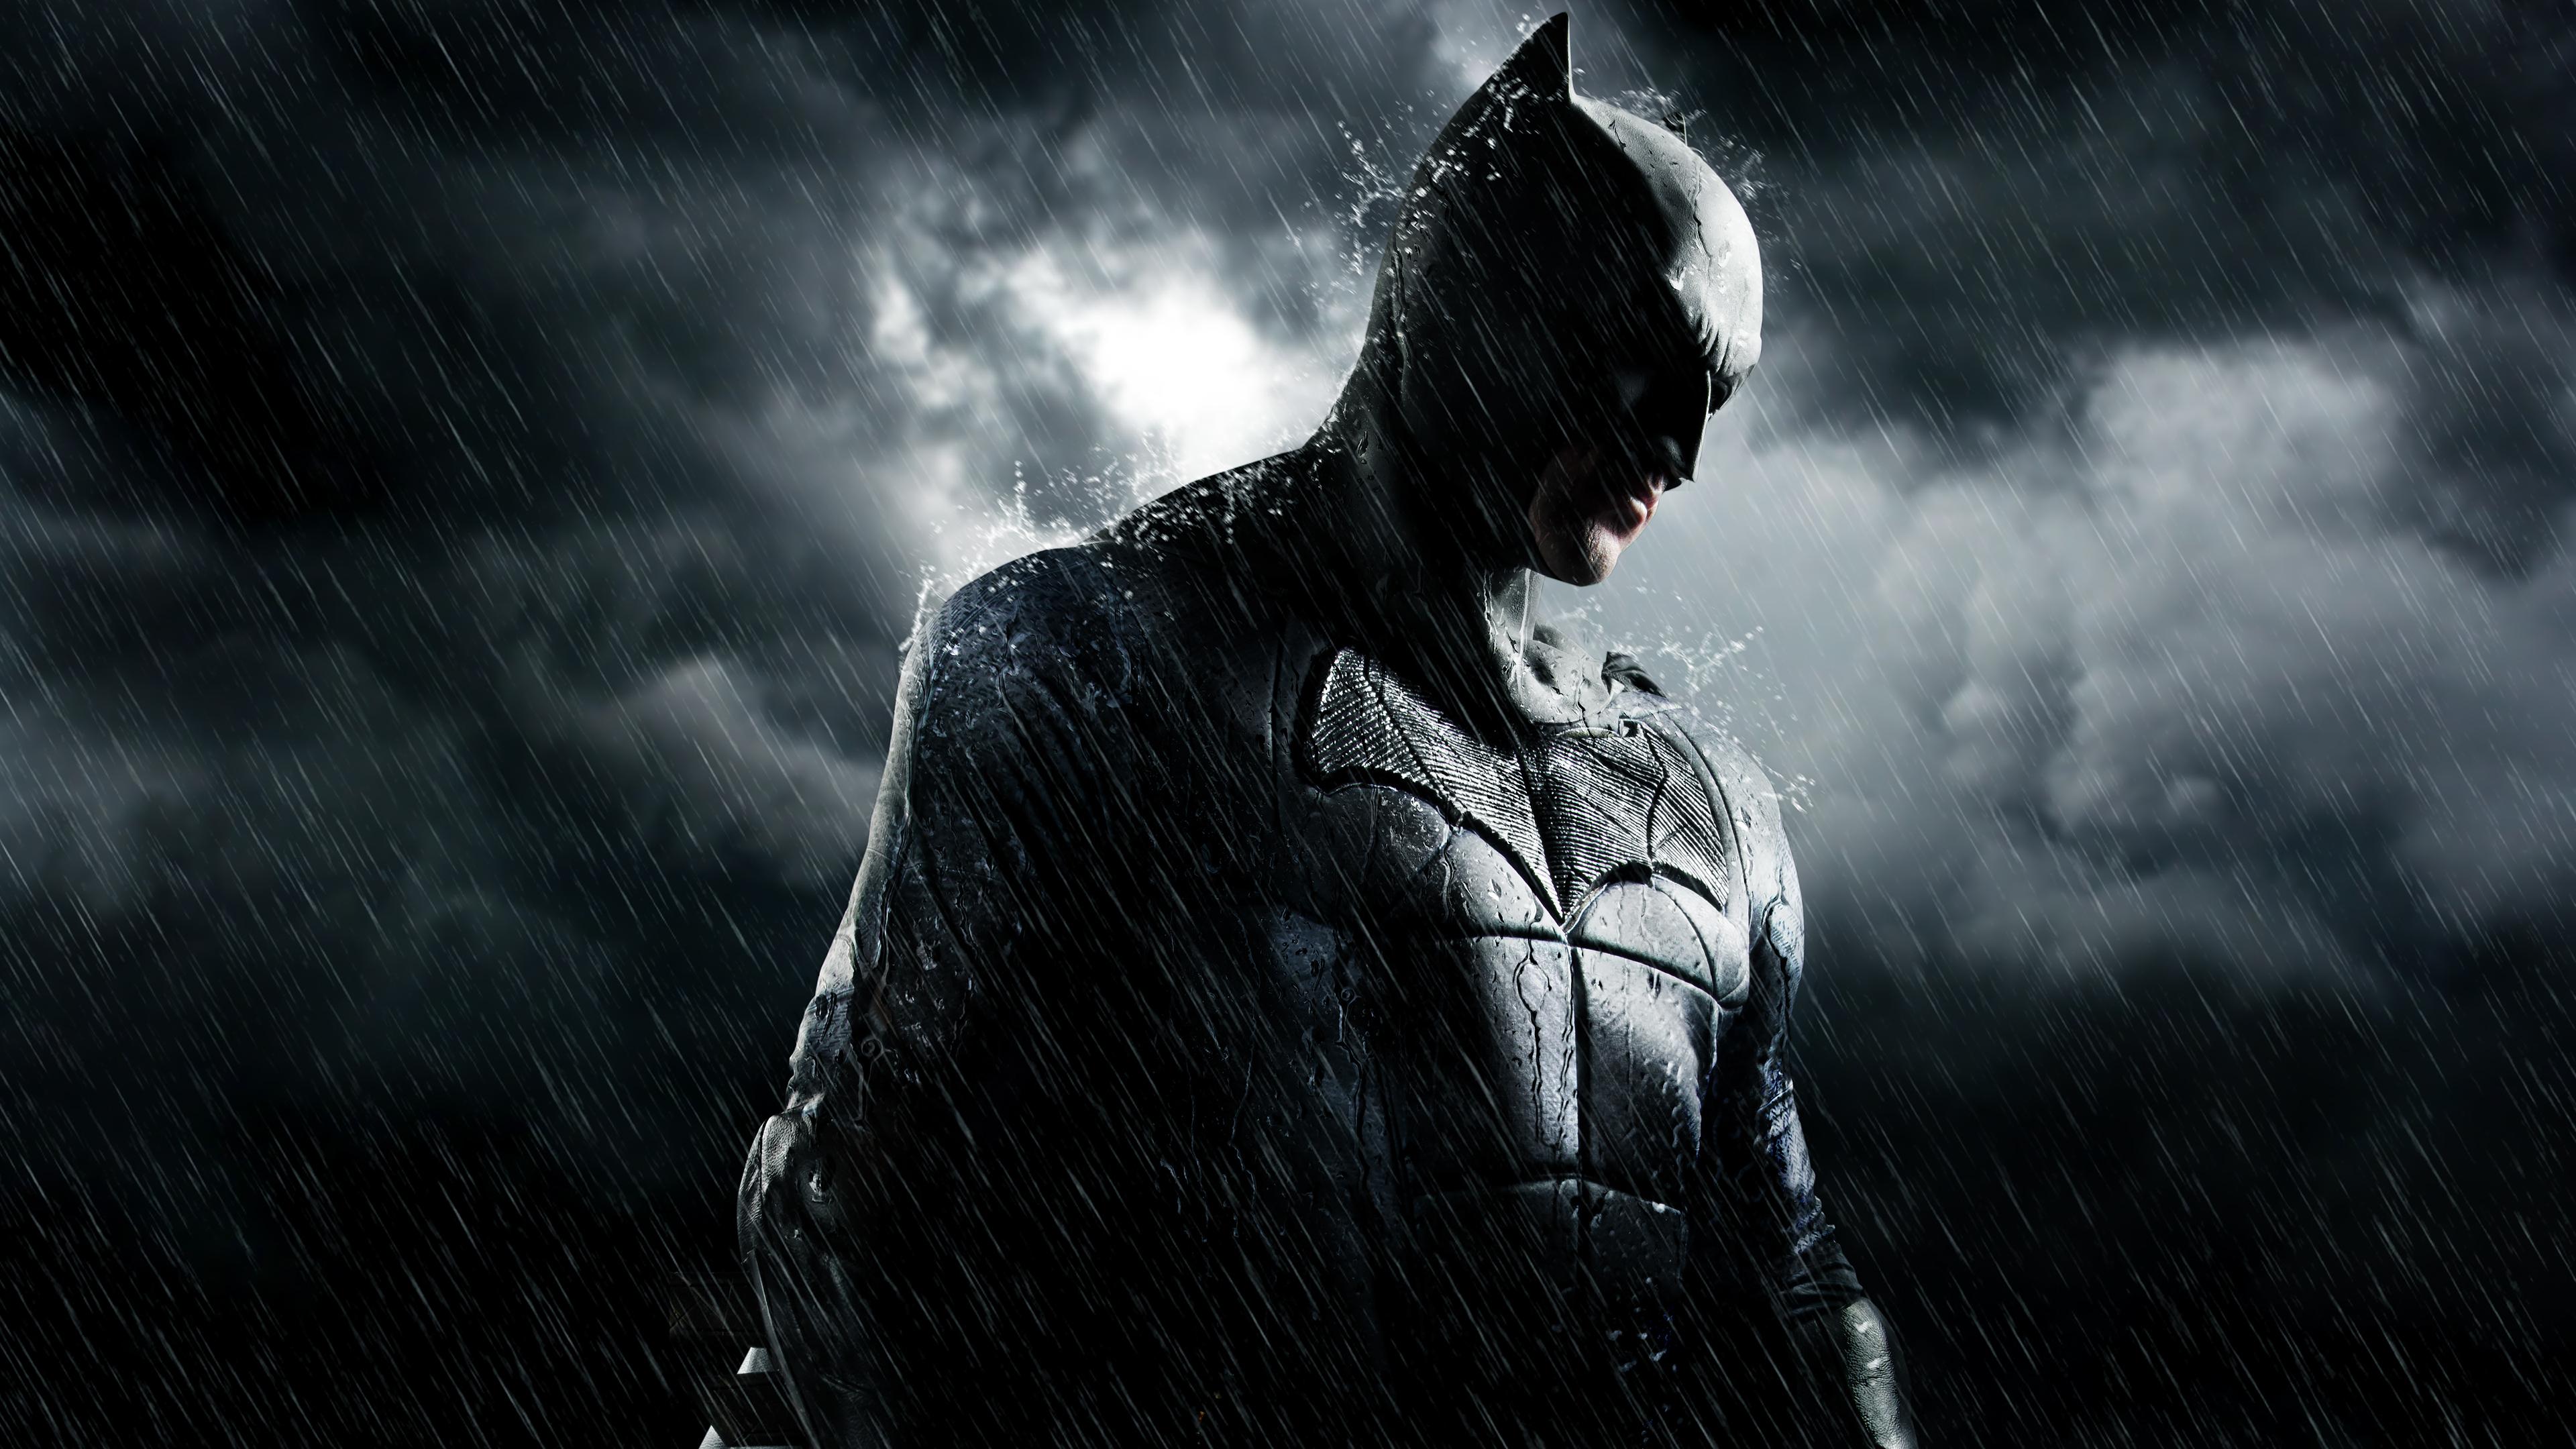 batman dark art 1576093361 - BatMan Dark art - dark knight wallpaper 4k, batman wallpaper phone hd 4k, batman wallpaper 4k, batman art wallpaper 4k, Batman 4k hd wallpaper